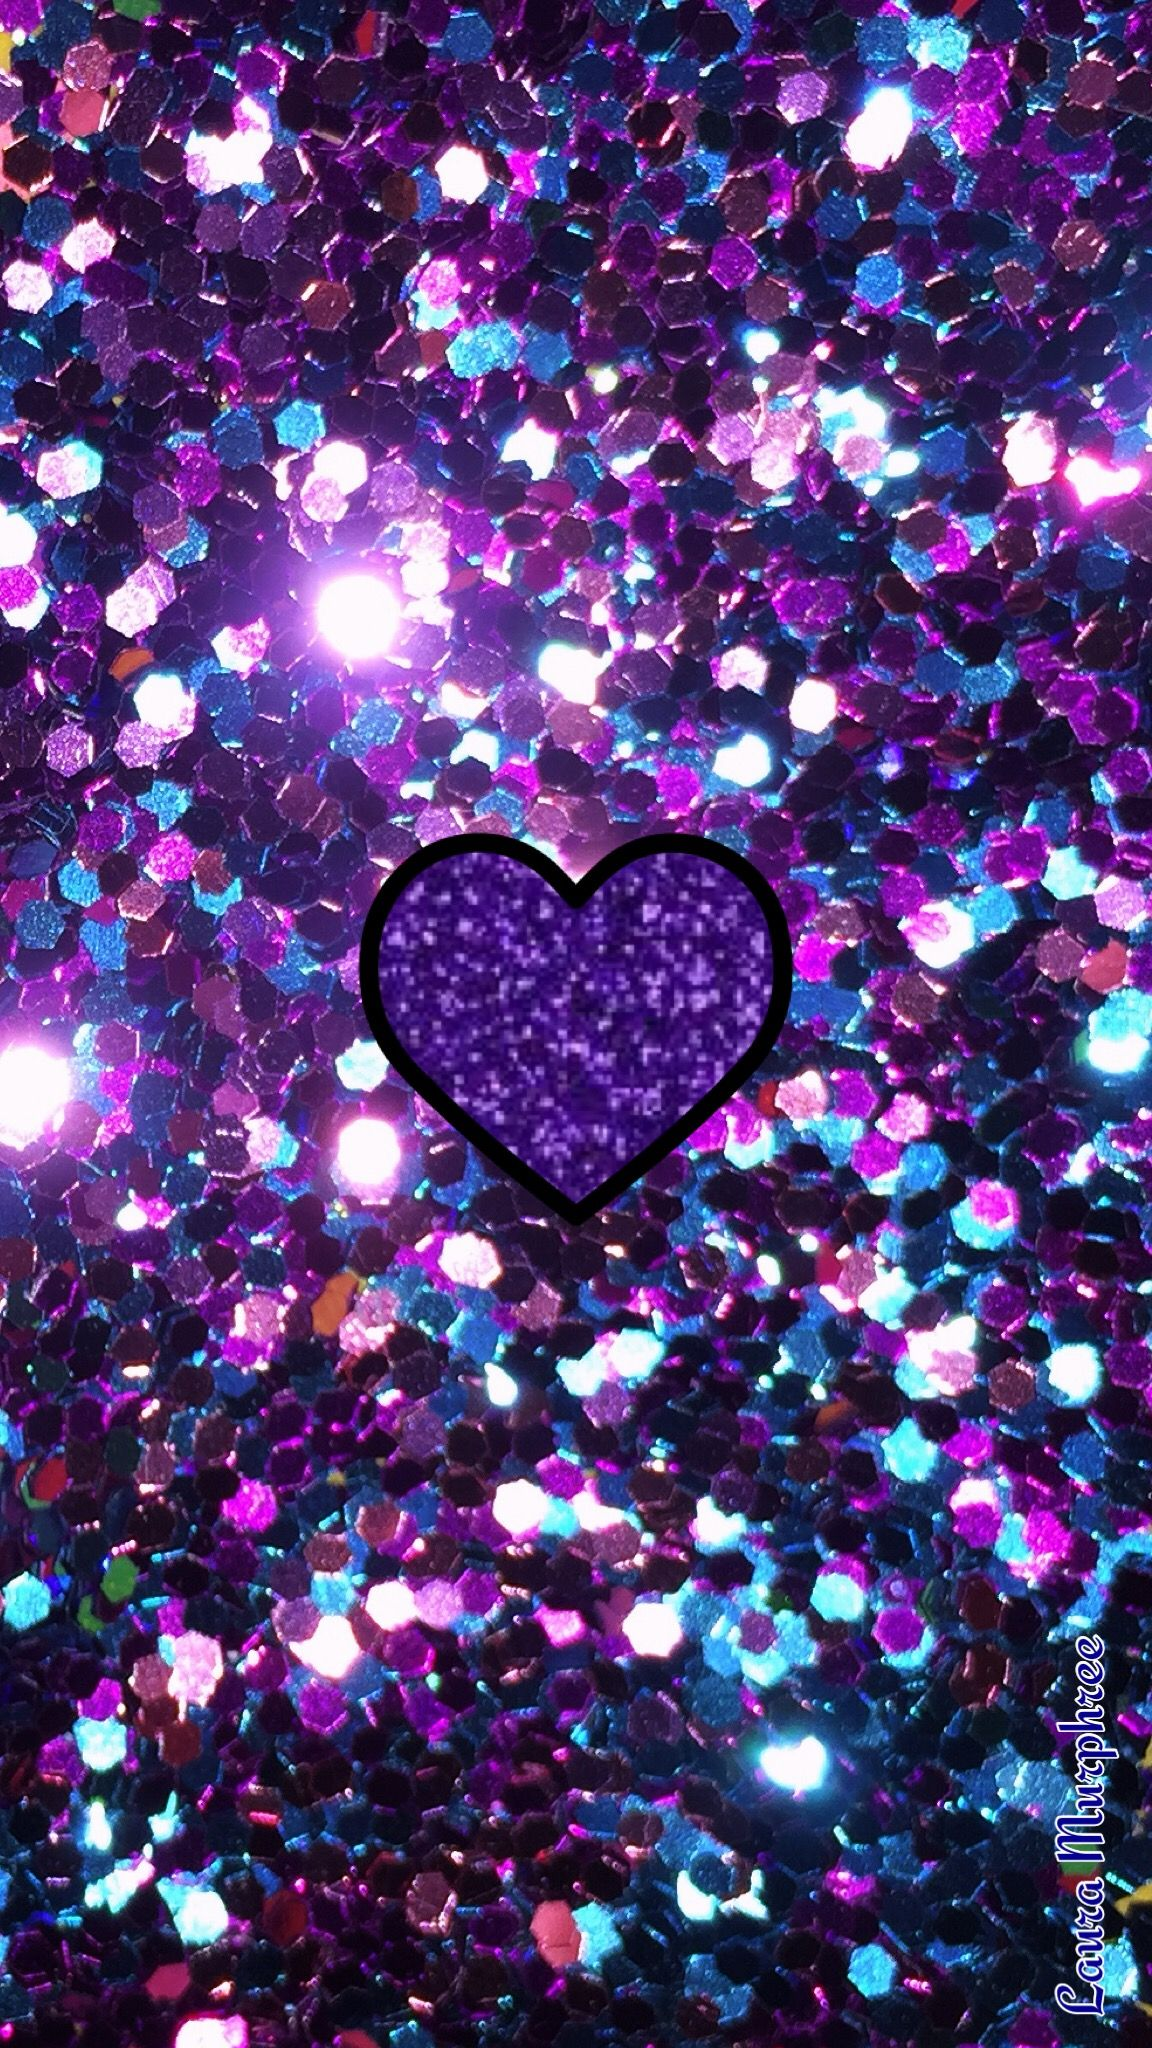 c138539f Glitter phone wallpaper sparkle background sparkling background bling shimmer  sparkles glitter glittery colorful heart blue purple